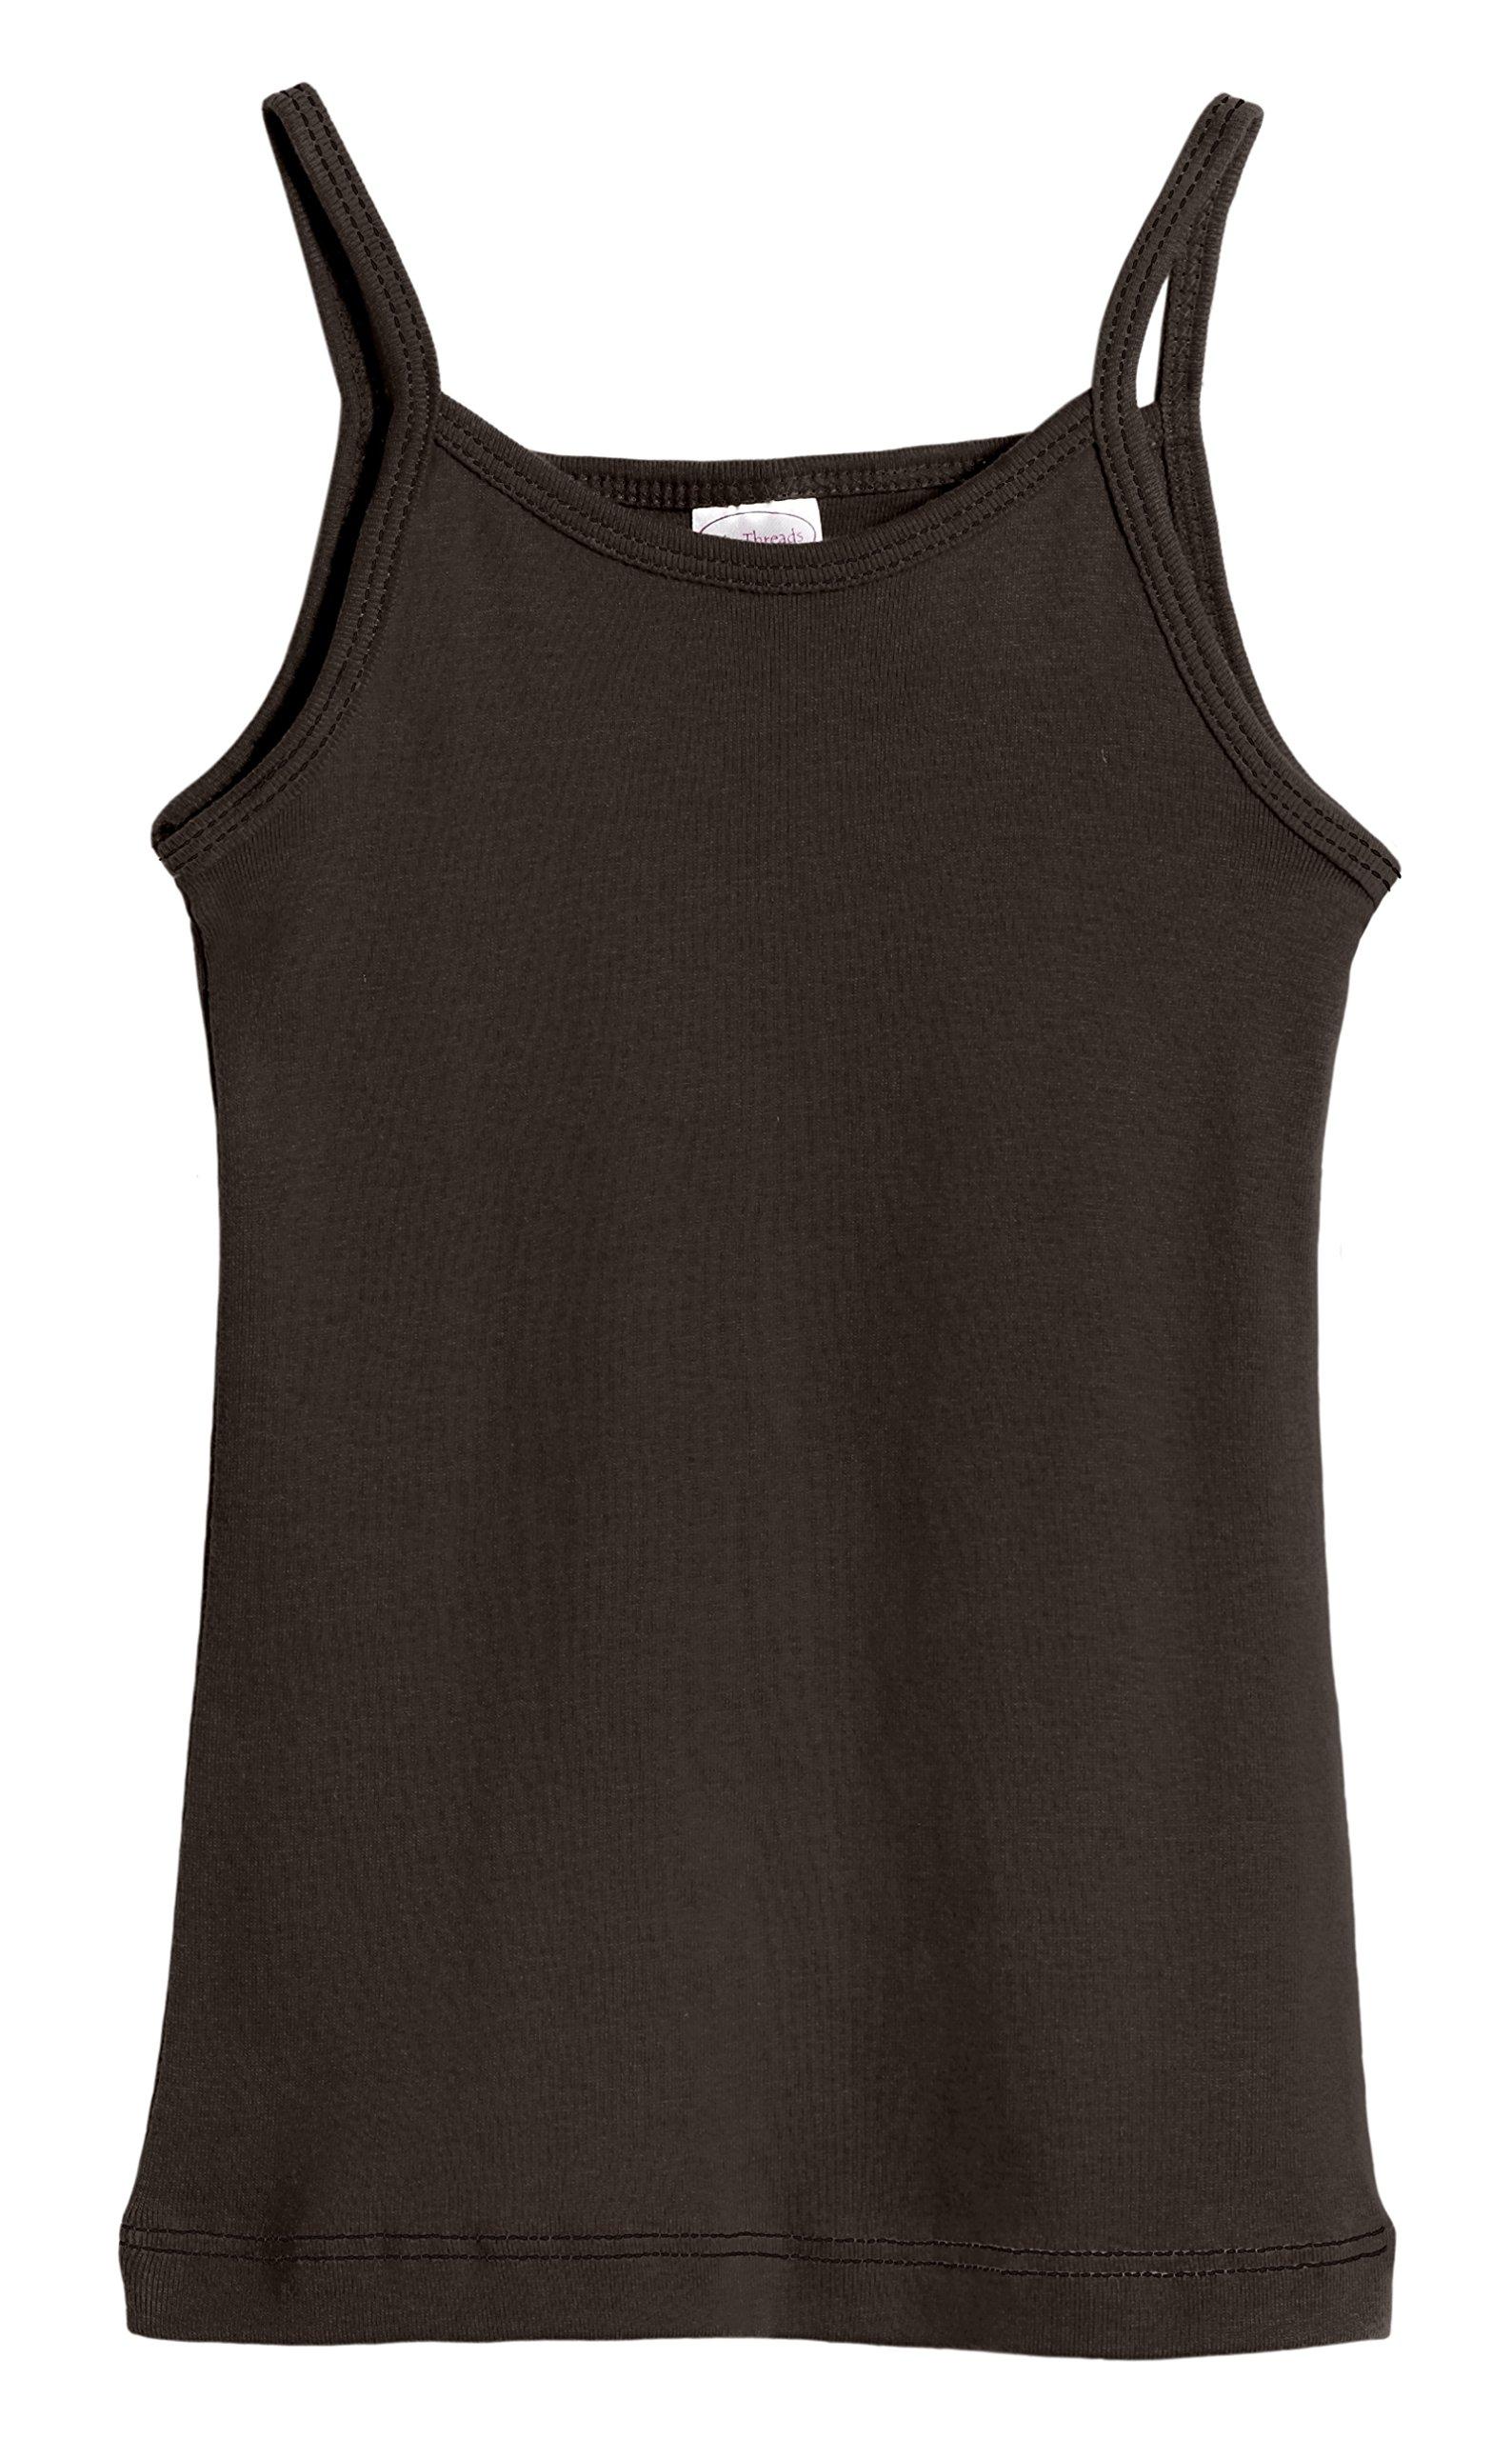 City Threads Big Girls' Cotton Camisole Cami Tank Top T-Shirt Tee Tshirt Spaghetti Straps Summer Play School Sports Sensitive Skin SPD Sensory Sensitive Clothing - Chocolate - 7